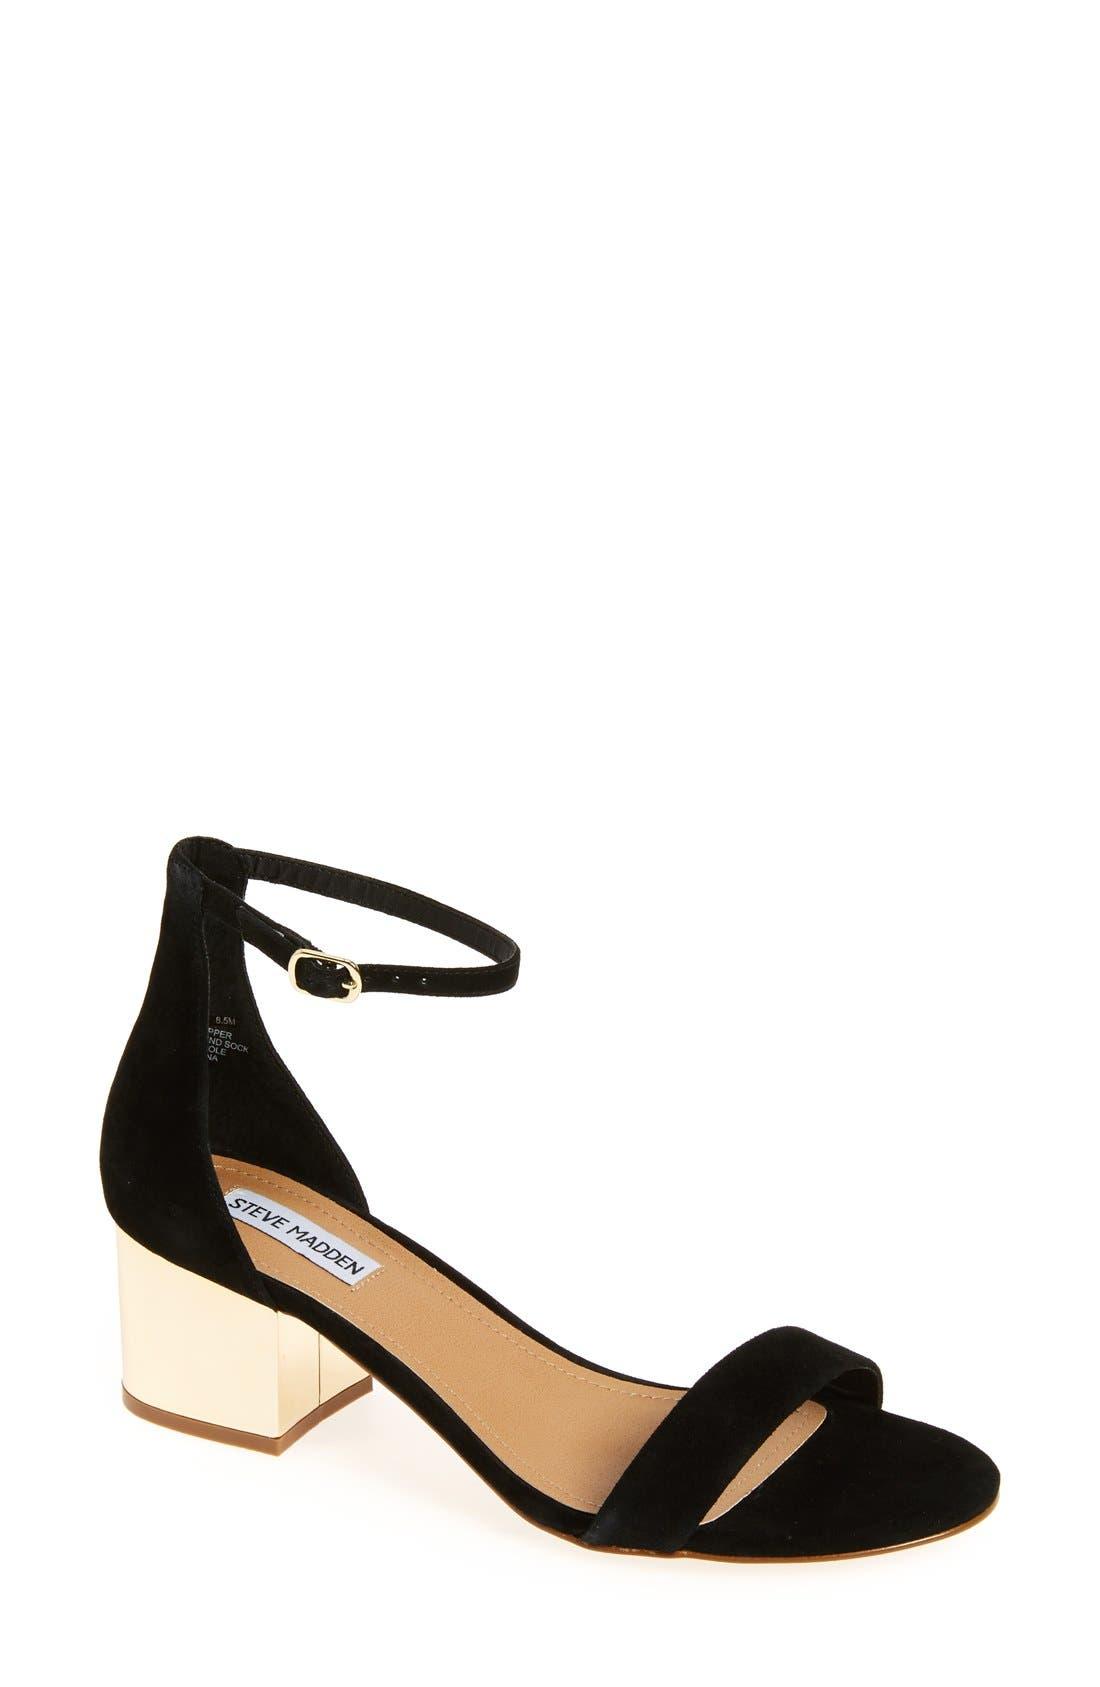 'Irenee-G' Mirror Block Heel Sandal,                             Main thumbnail 1, color,                             006